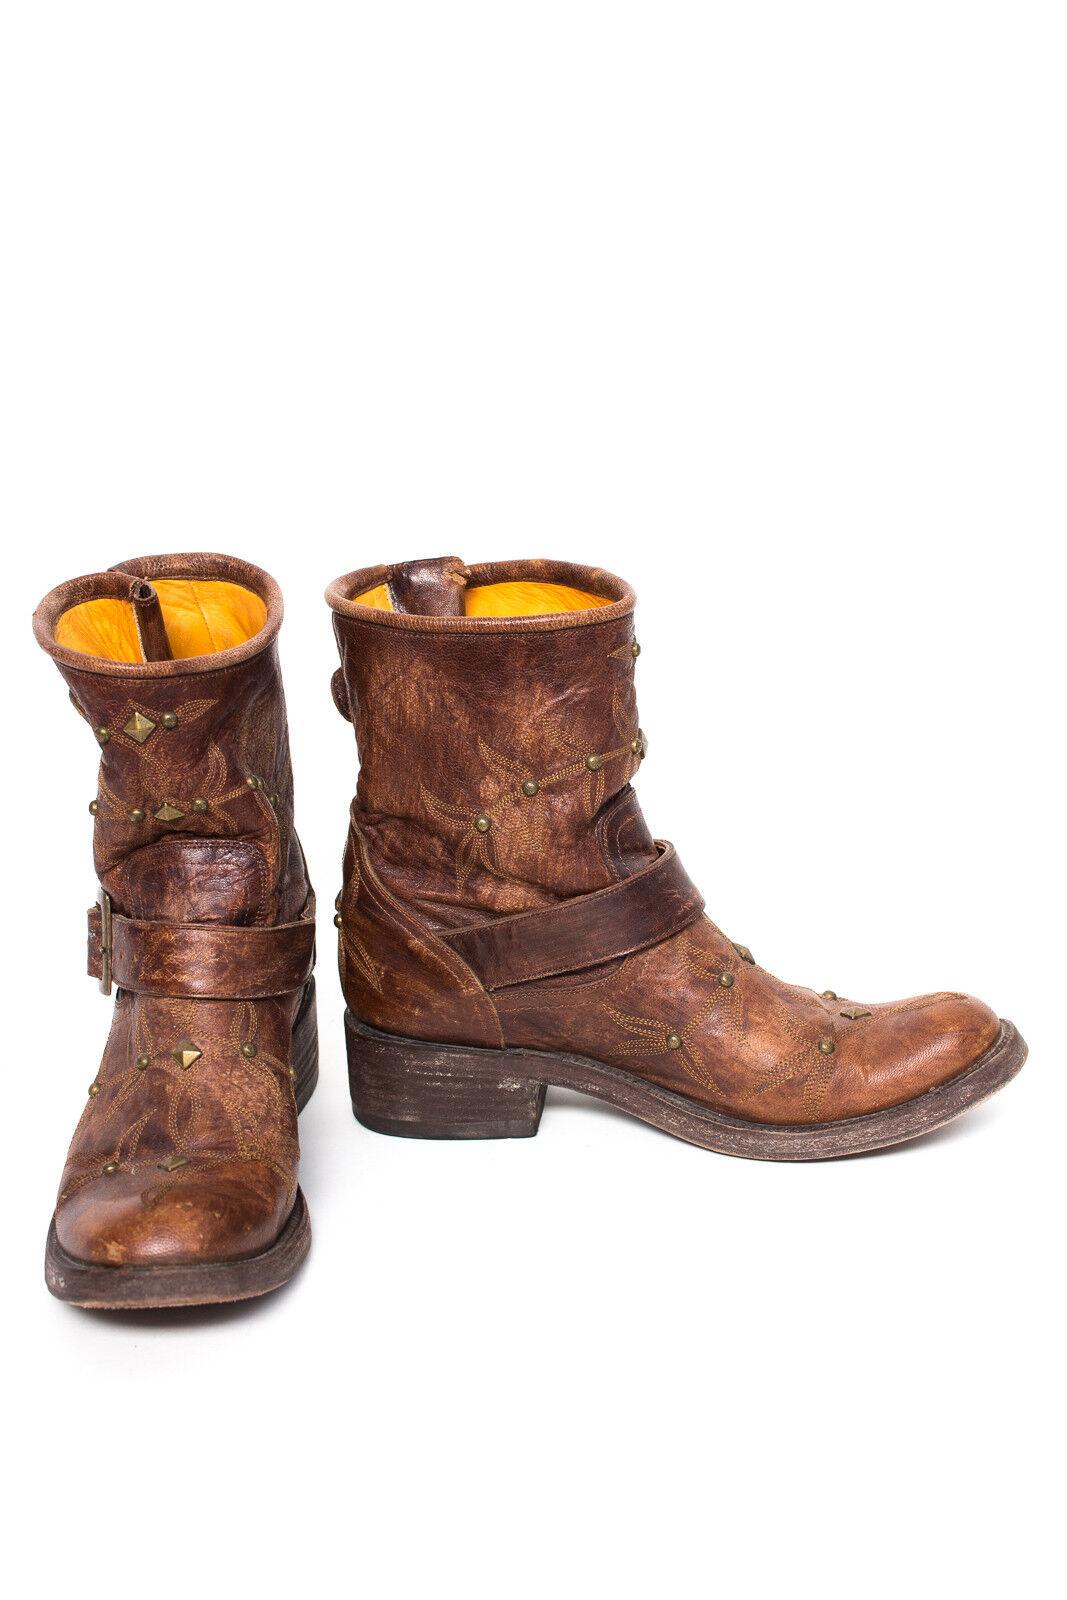 Mexicana señora zapatos stefeletten talla cuero marrón